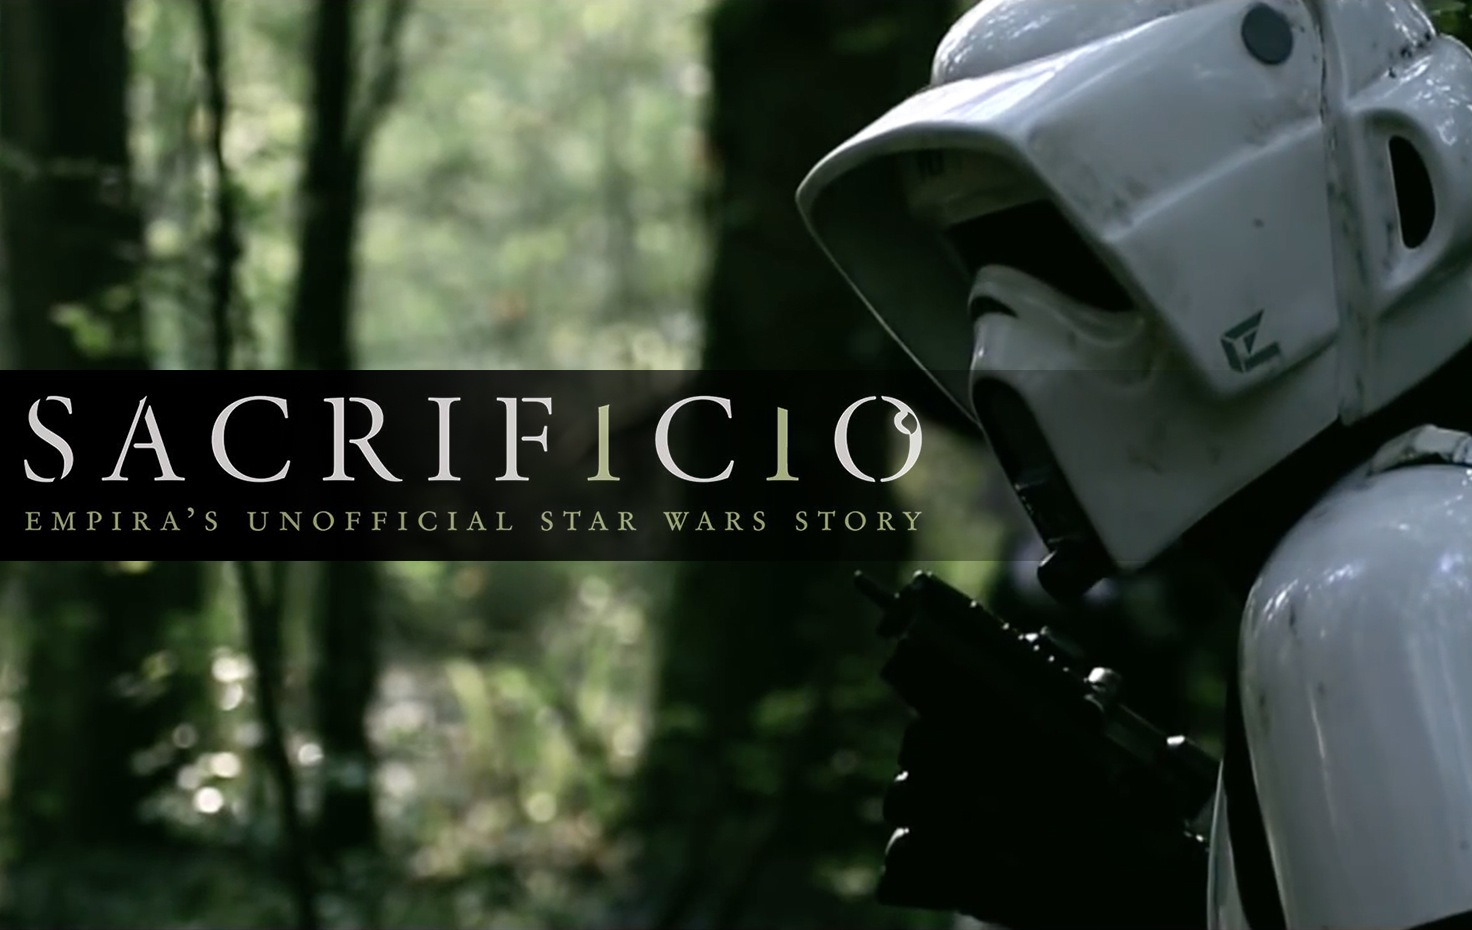 Sacrificio: A Star Wars FanFilm creato da Empira - Crowdfunding